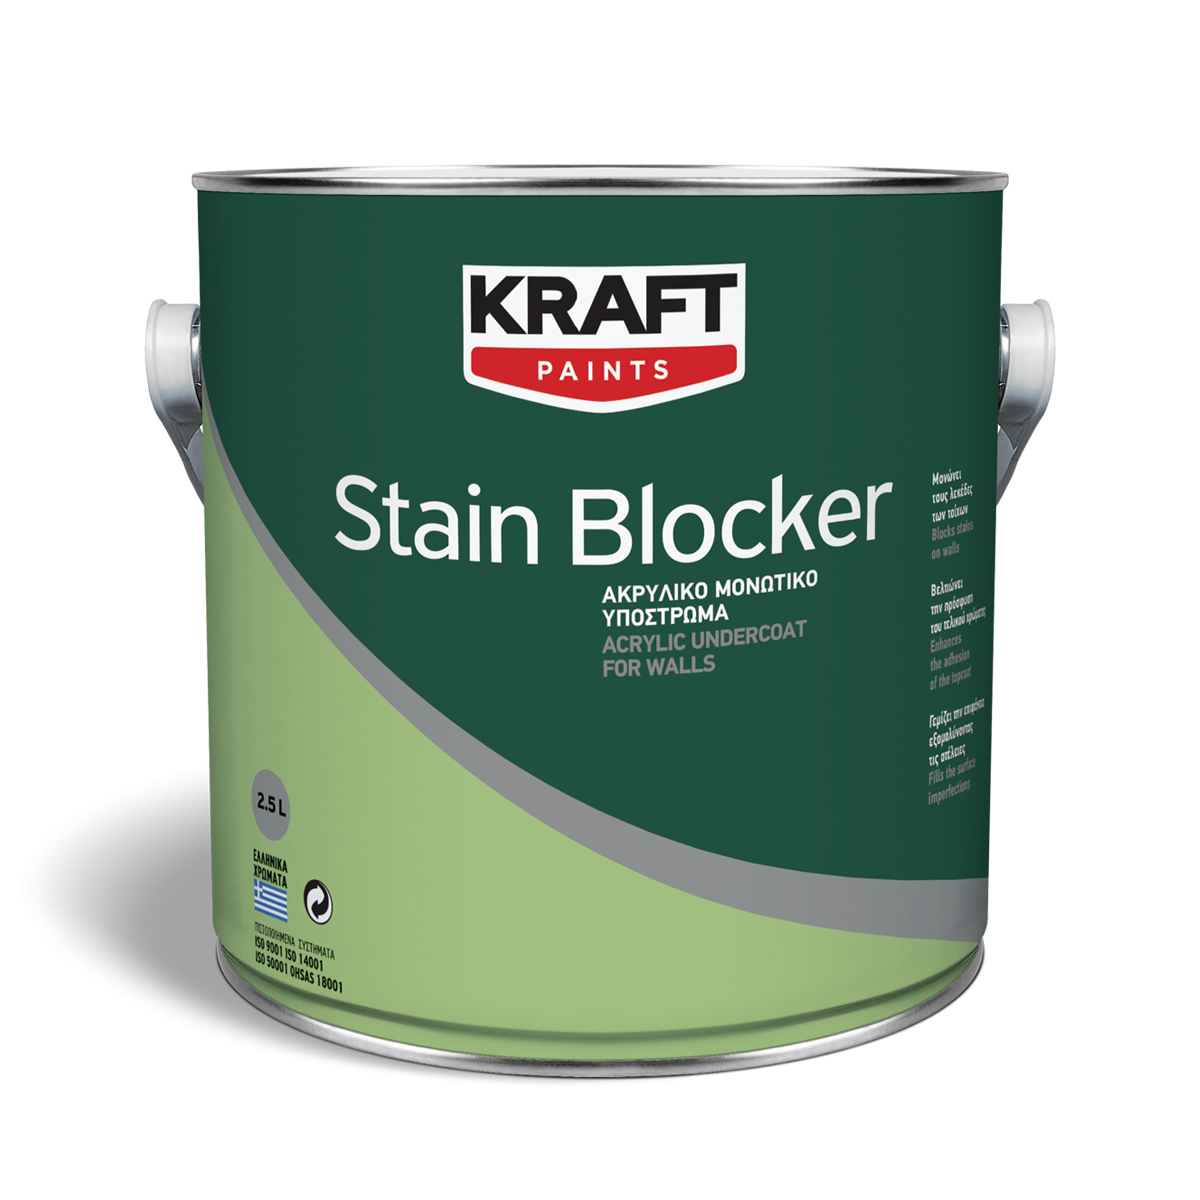 Stain-Blocker-1200x1200px-1